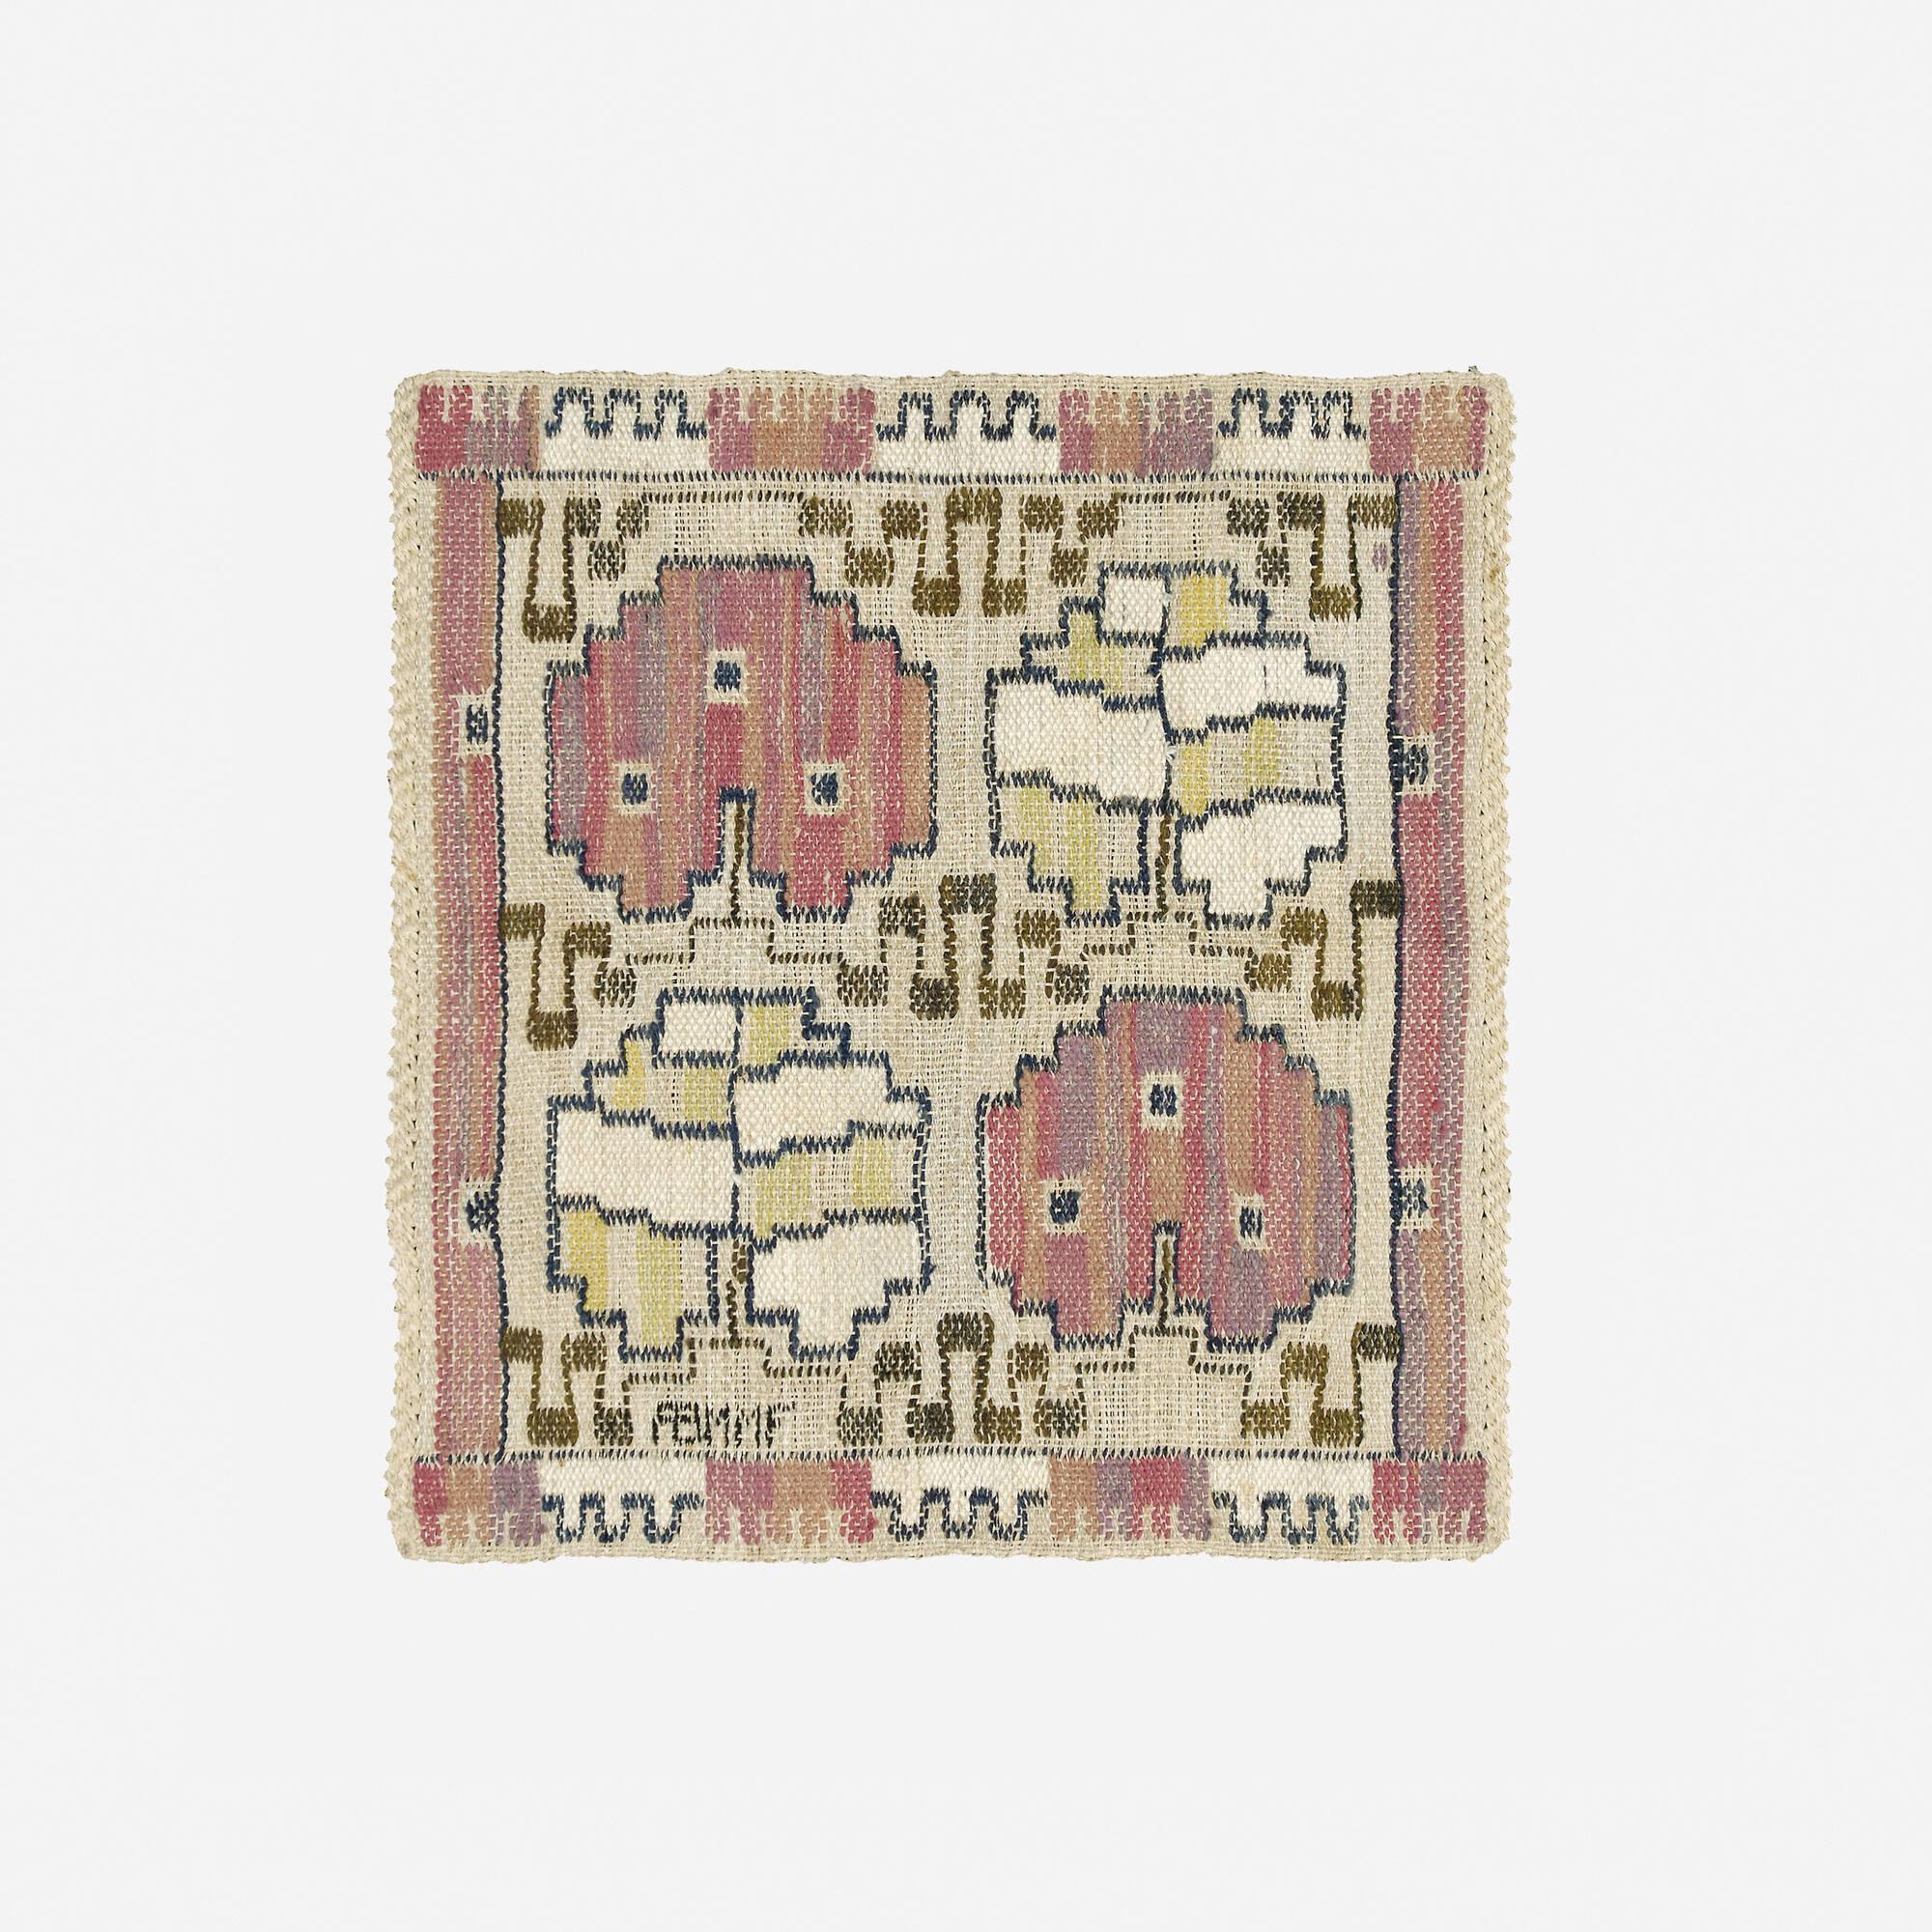 155: Märta Måås-Fjetterström / Grodblad tapestry weave pillow case (1 of 1)